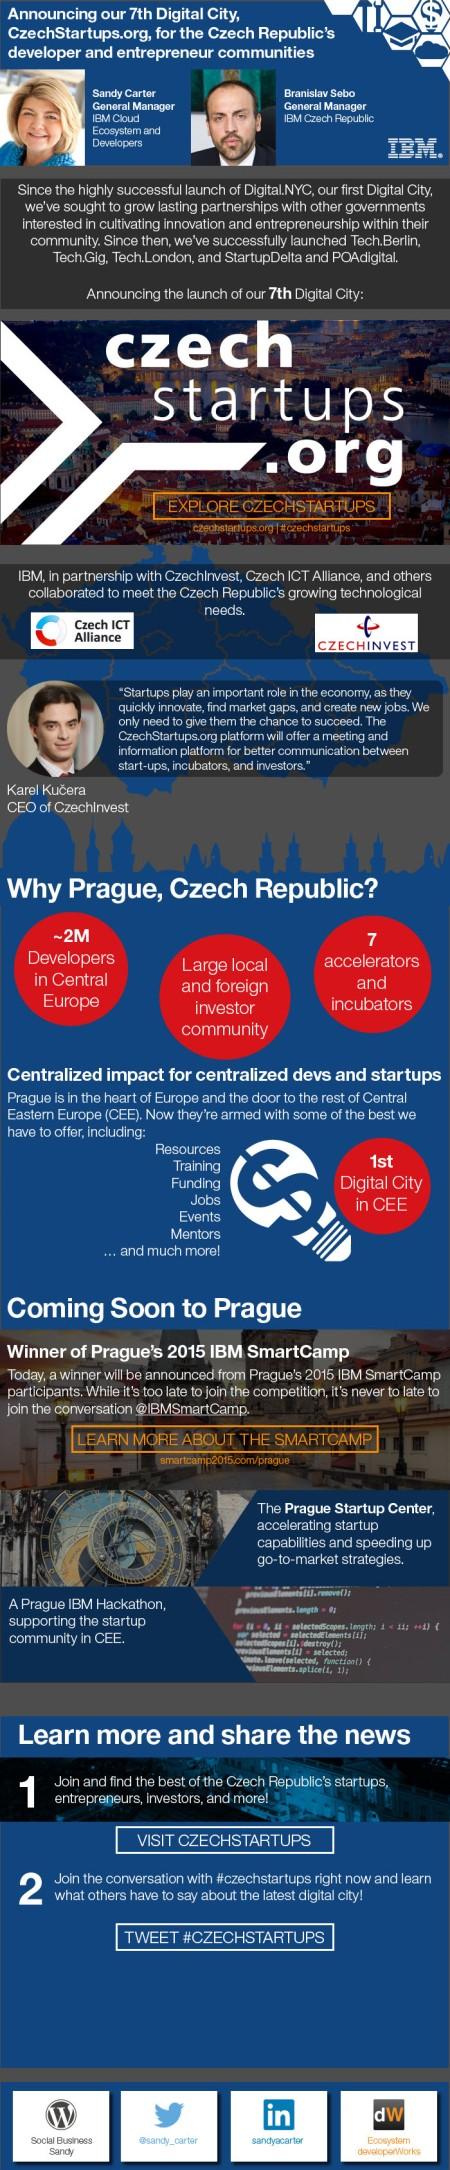 cz_infographic_v1-01